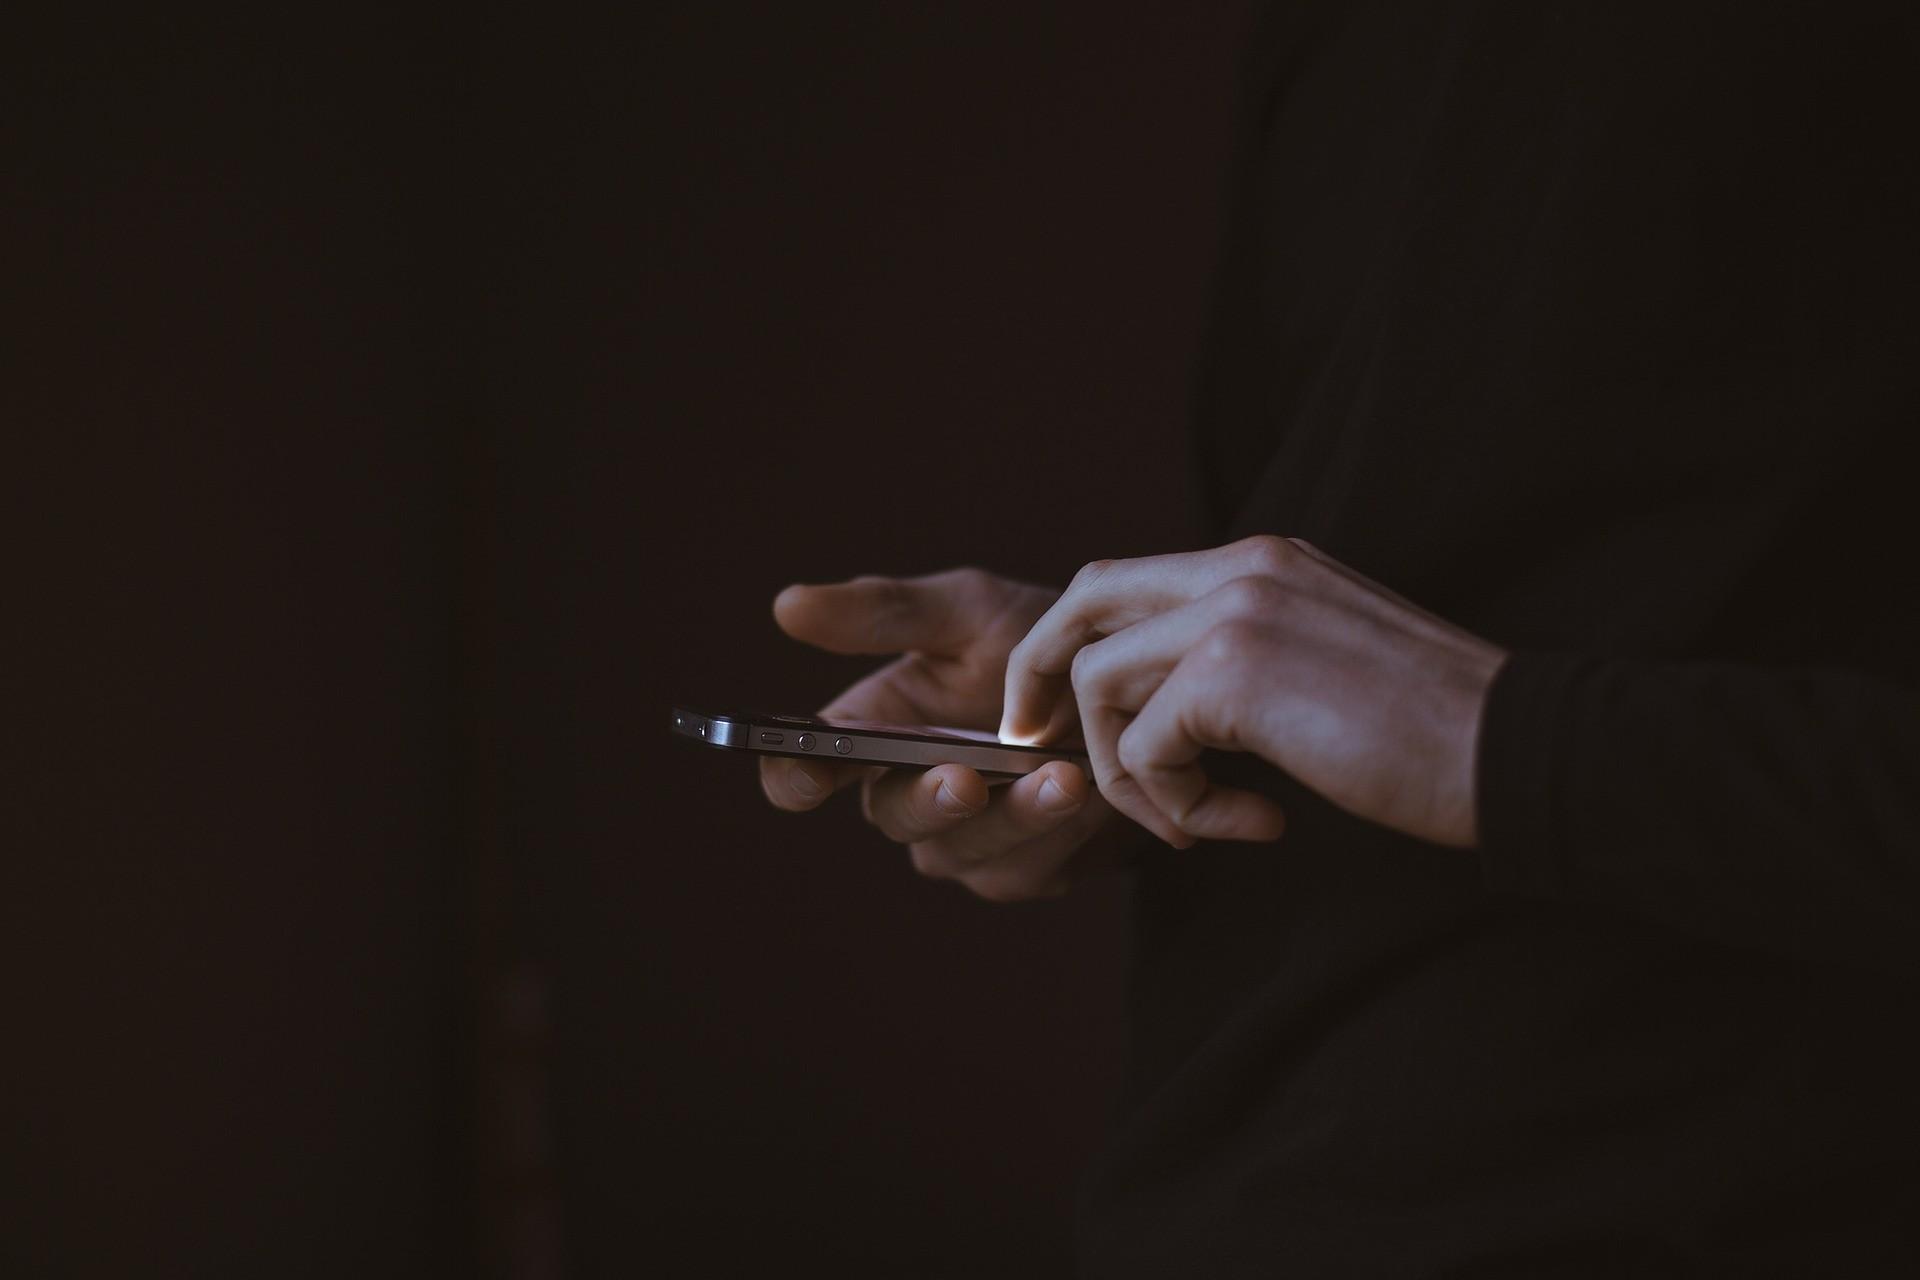 Empresa que compra brechas de software diz que vai parar de aceitar falhas no iPhone por 'oferta elevada'